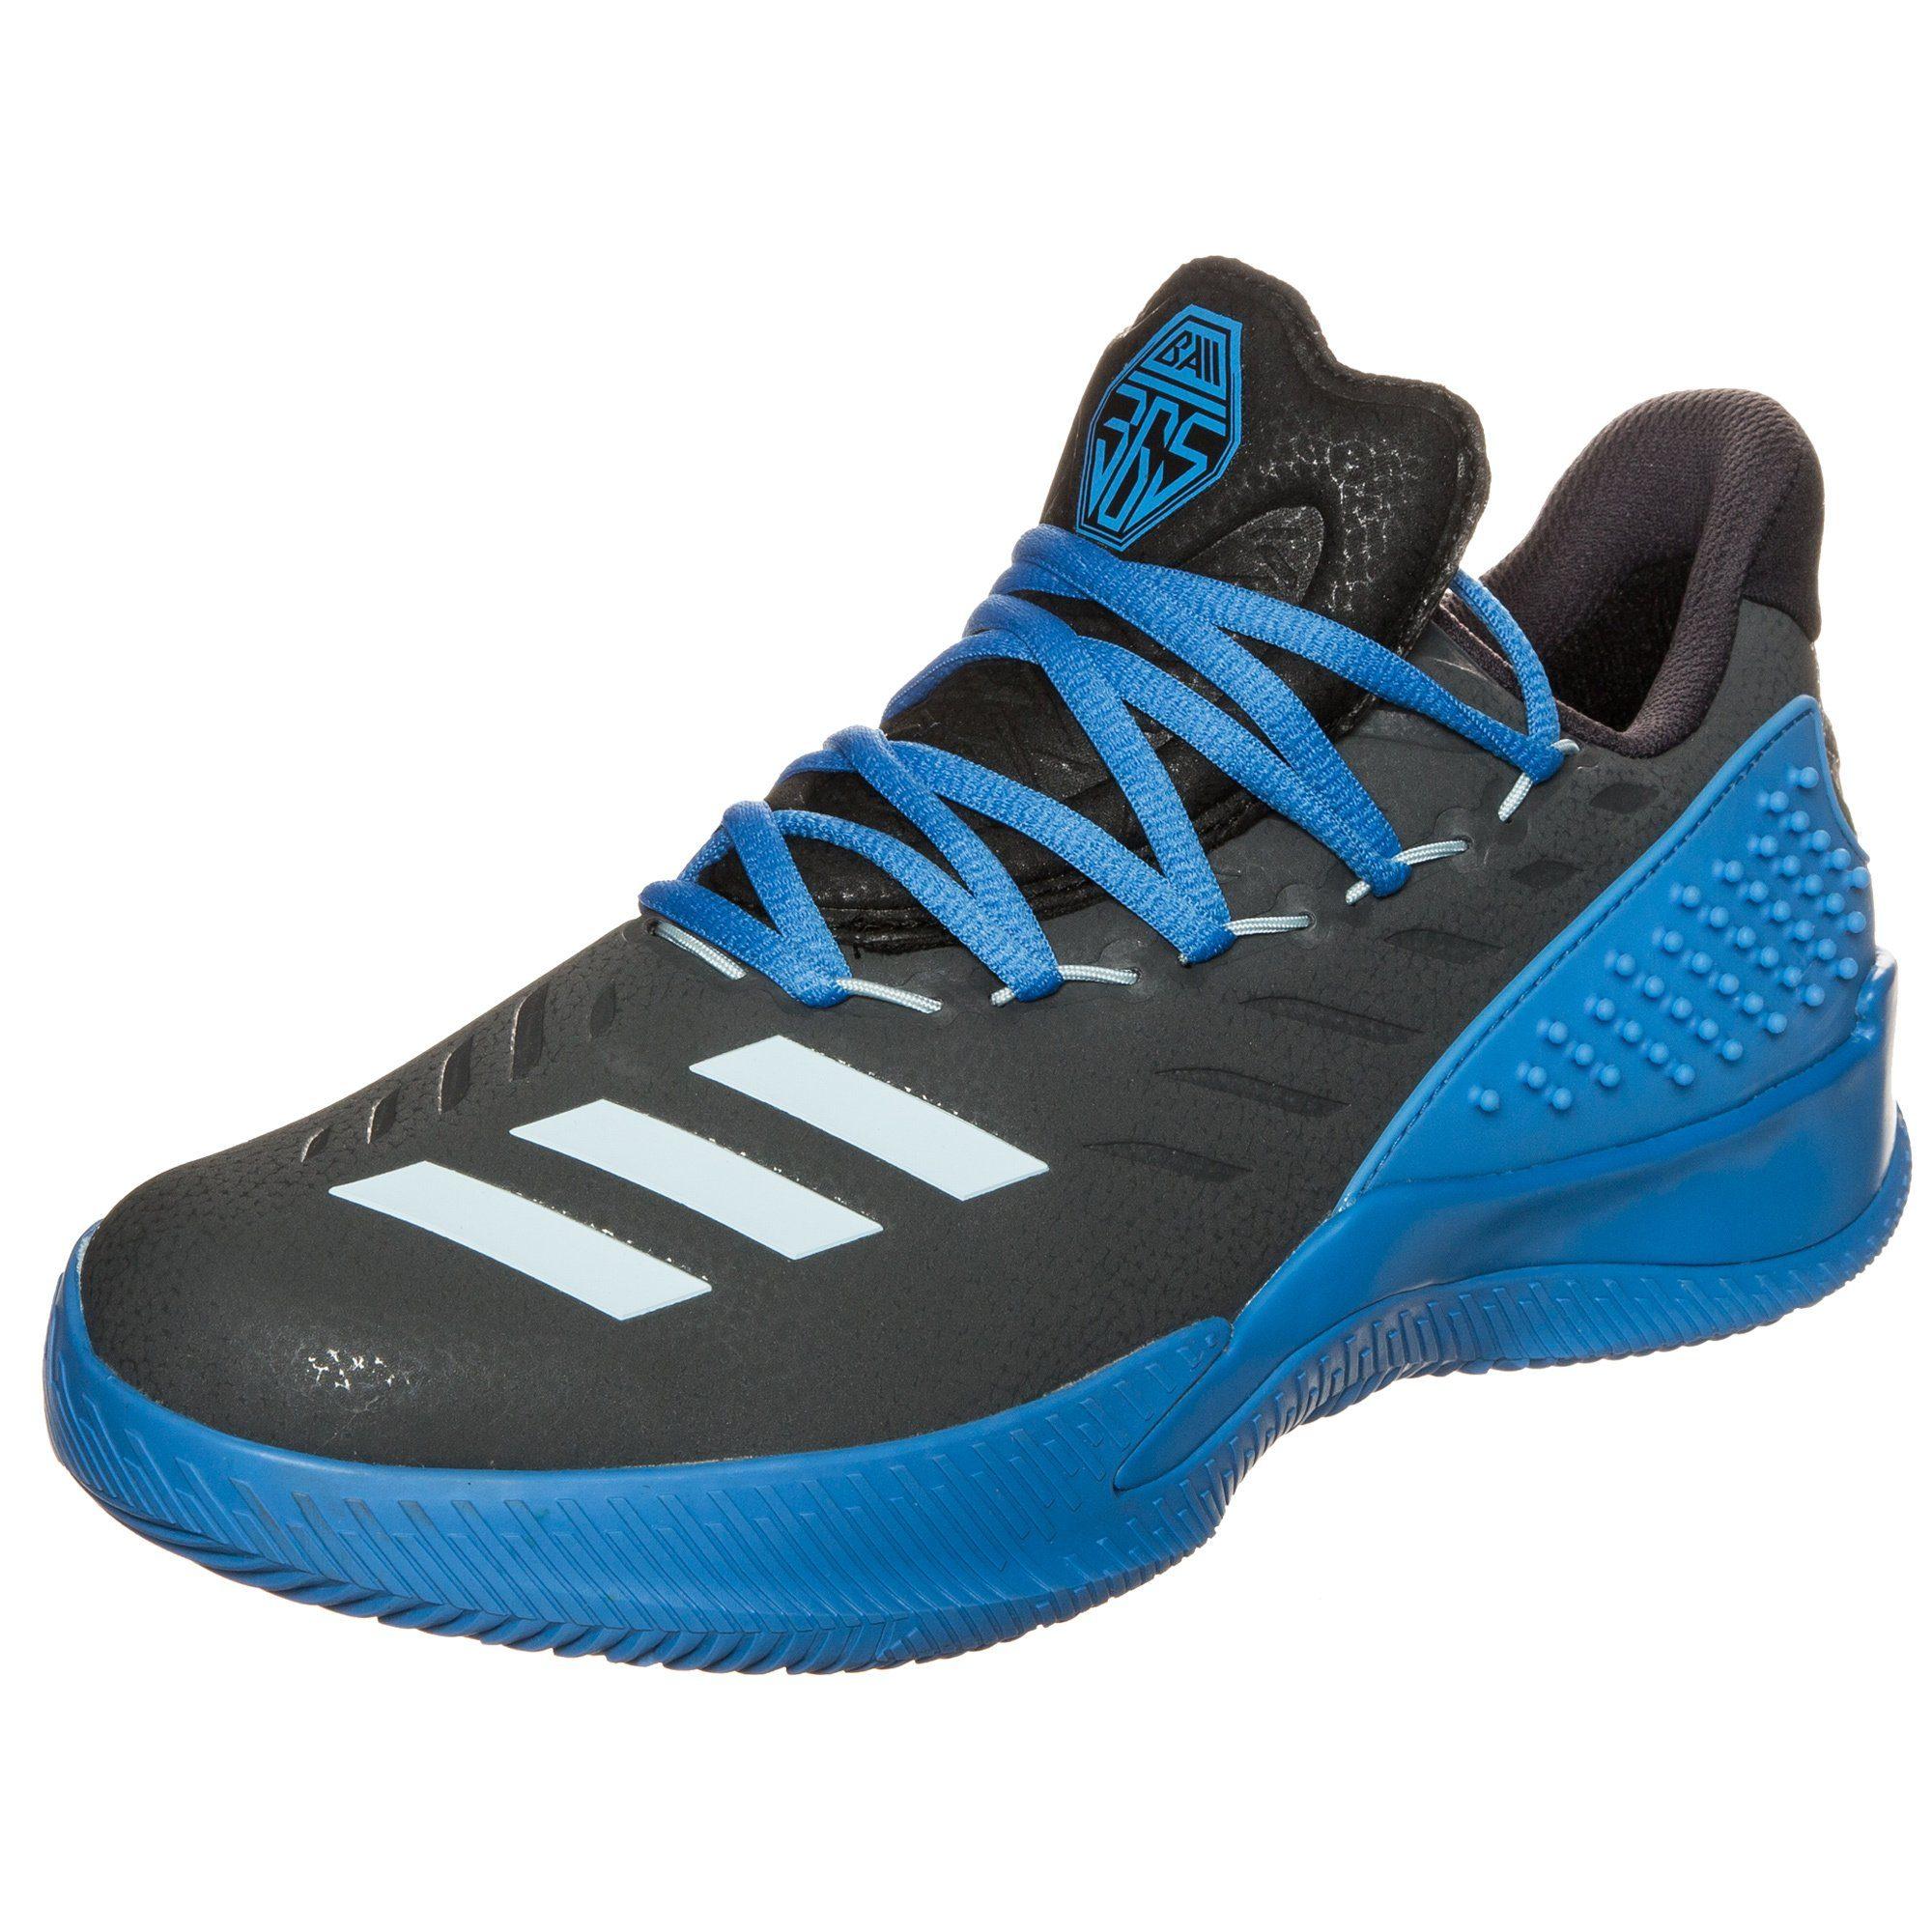 Image of adidas Performance Ball 365 Basketballschuh Herren